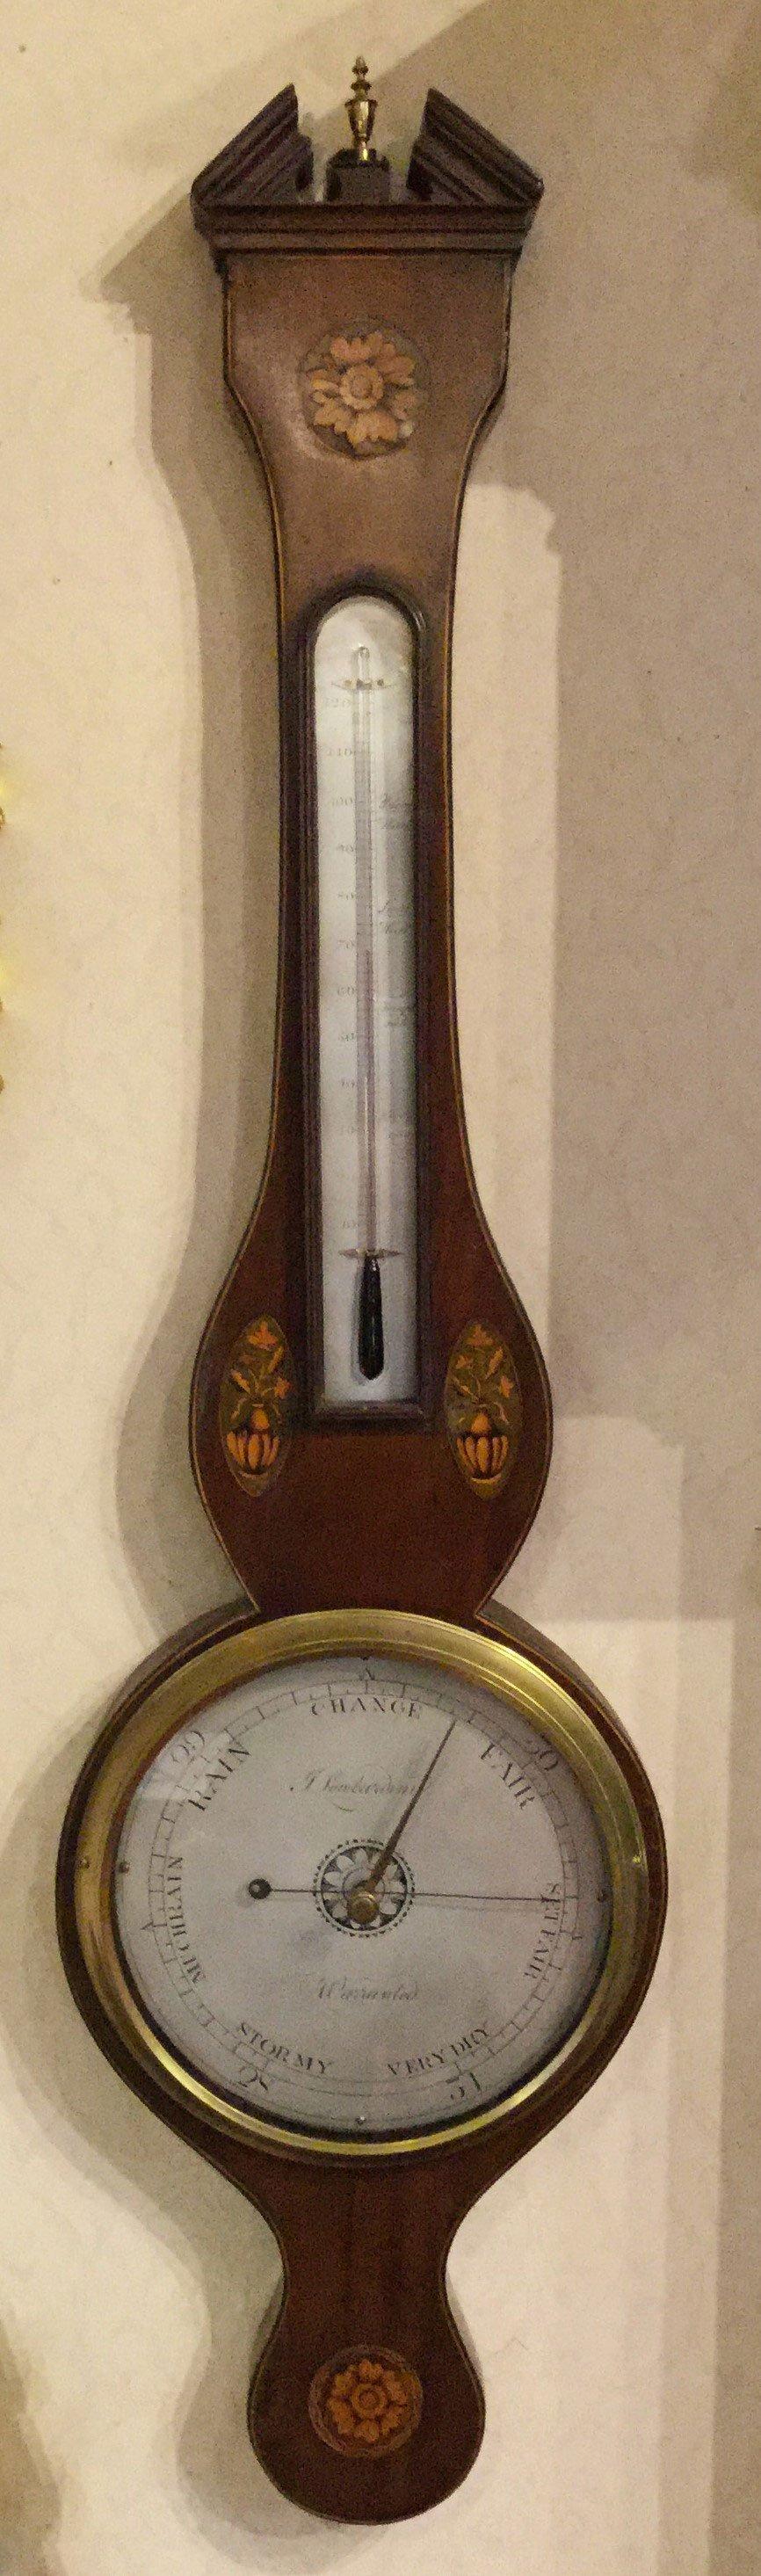 Shell inlayed barometer